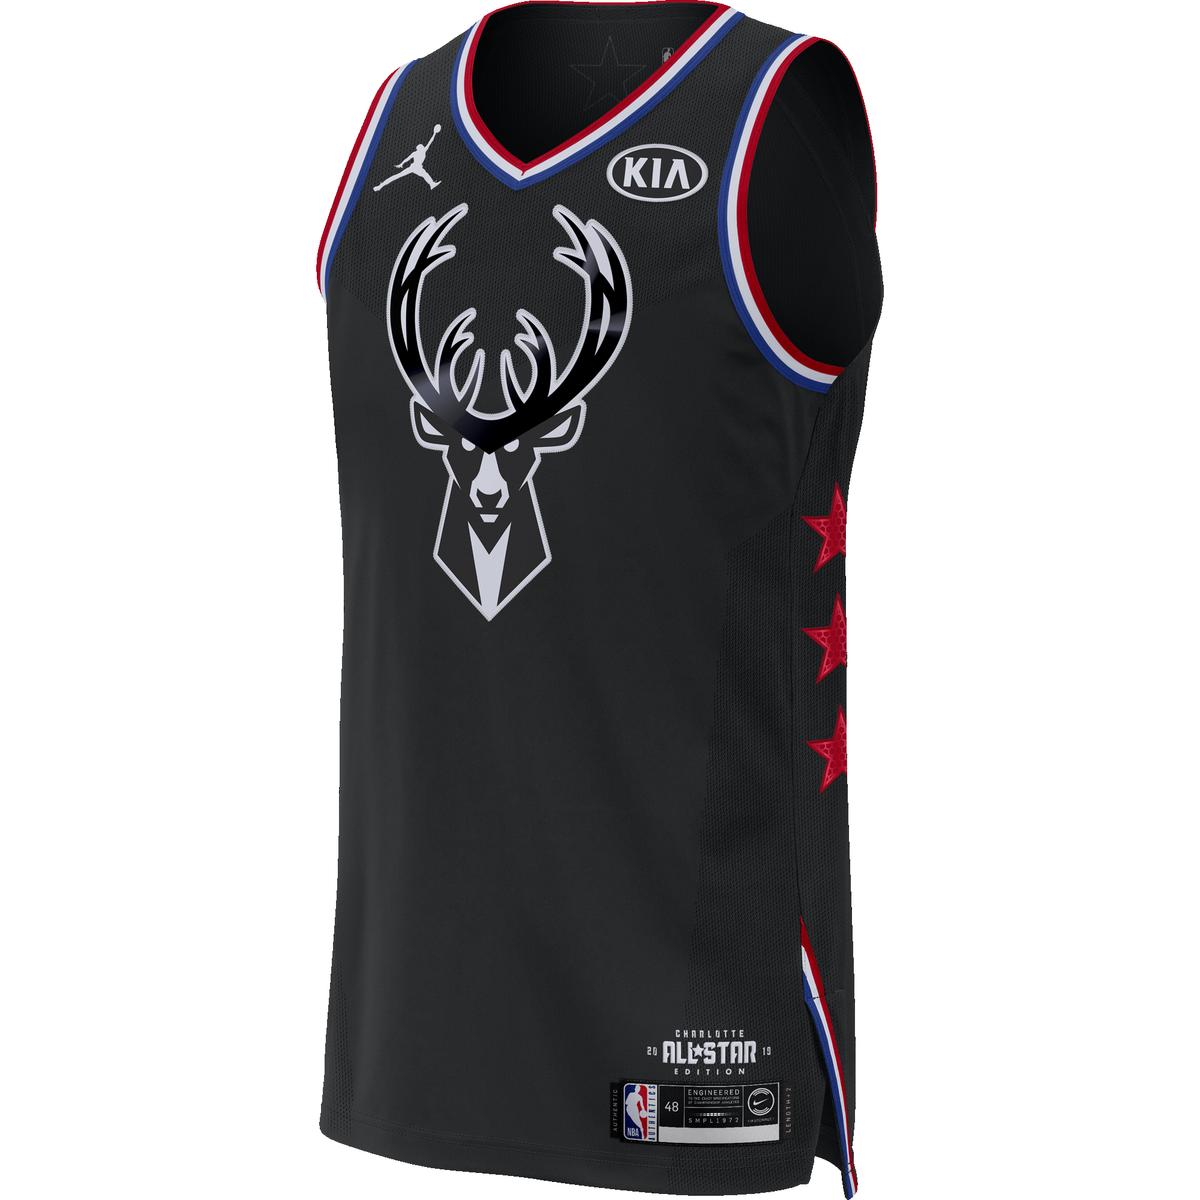 dc273295 Giannis Antetokounmpo 2019 All-Star Game Nike Swingman Jersey for $119.99  Fanatics